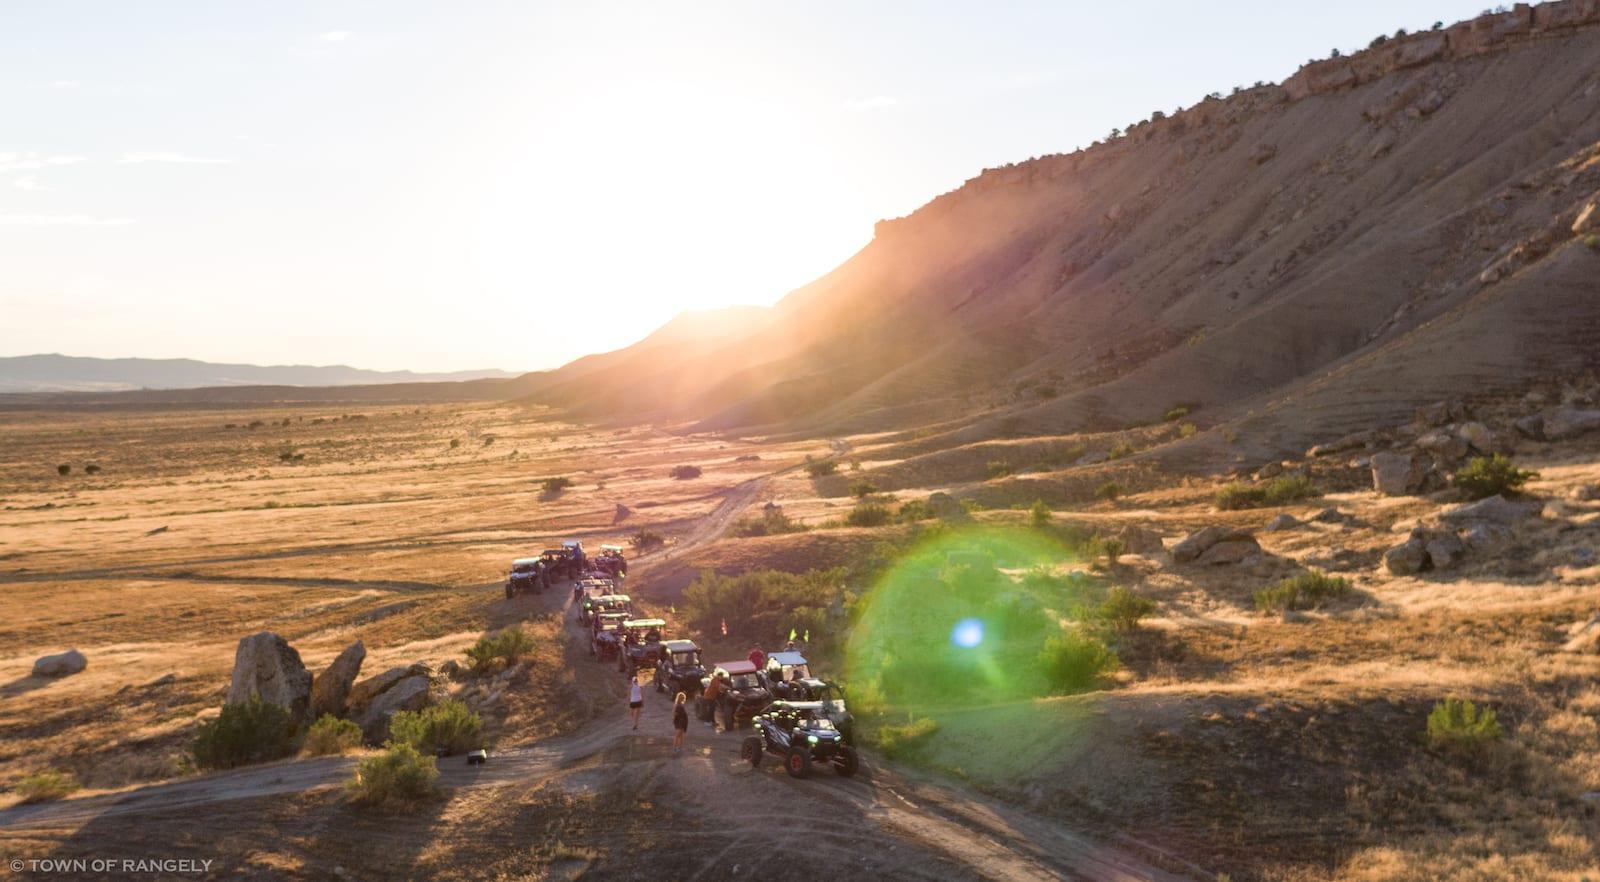 Rangely OHV Adventure Rally (ROAR) Event